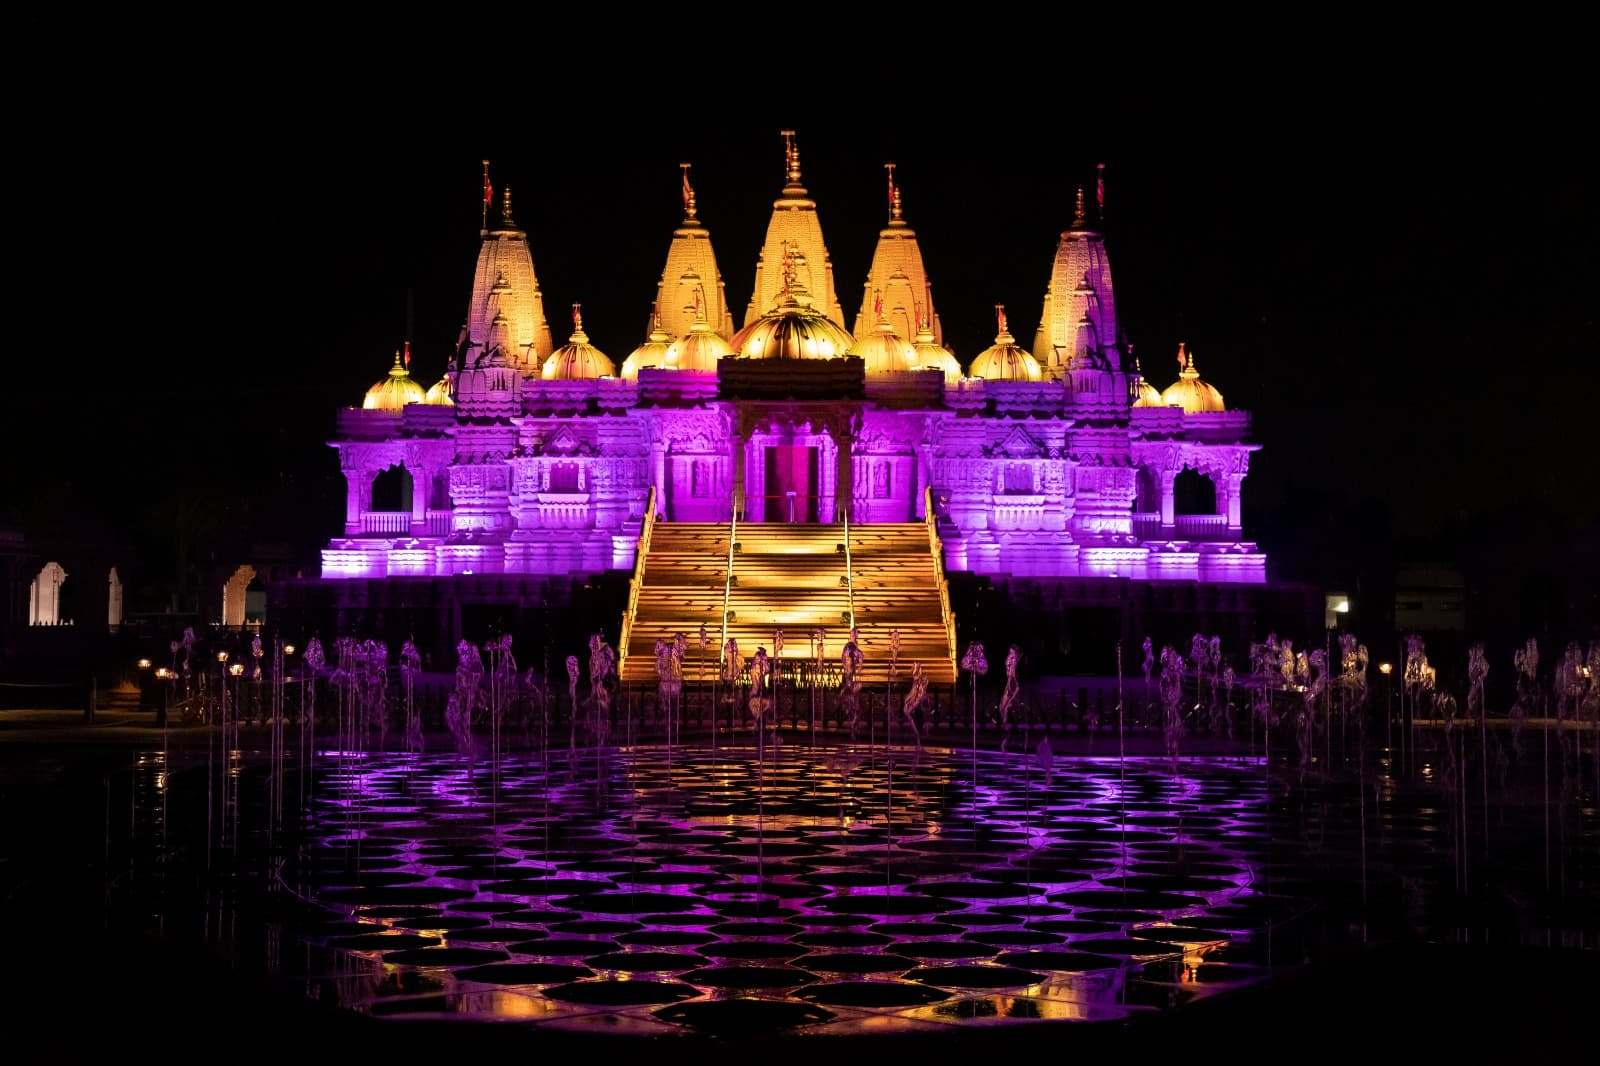 BAPS Hindu temple, Chino Hills Purple and Gold for Kobe Bryant